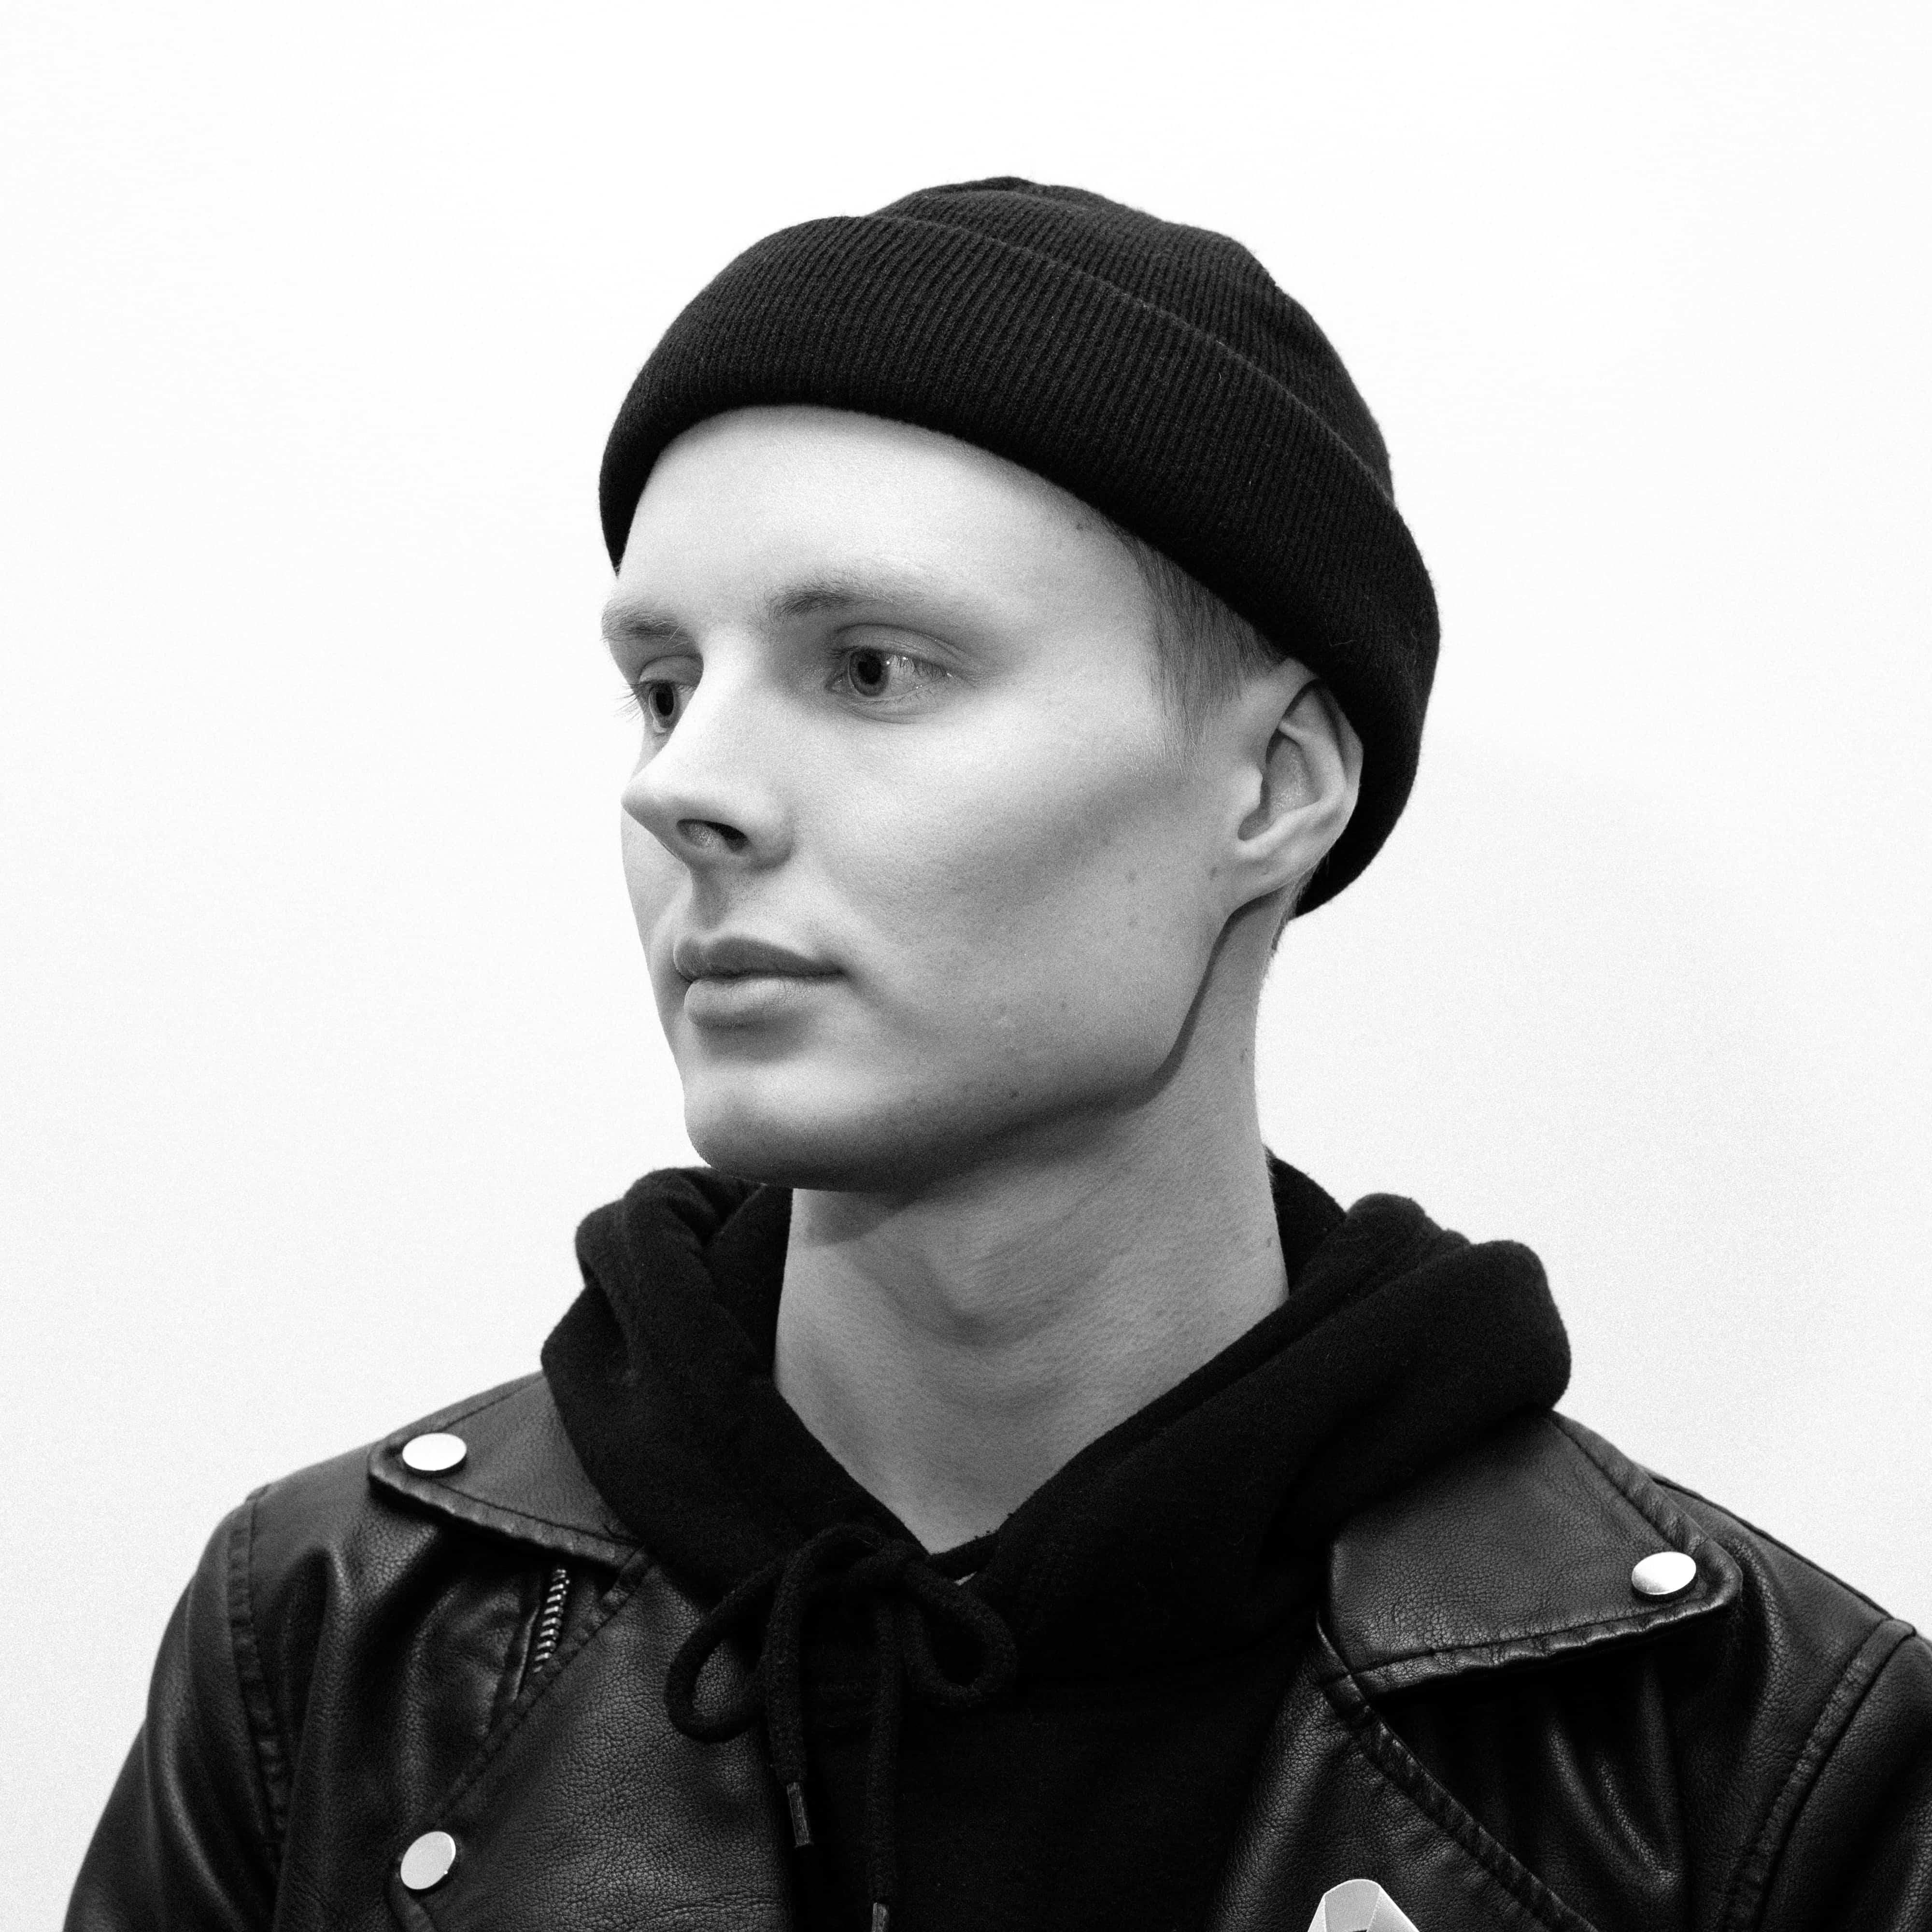 Tuomo Korhonen